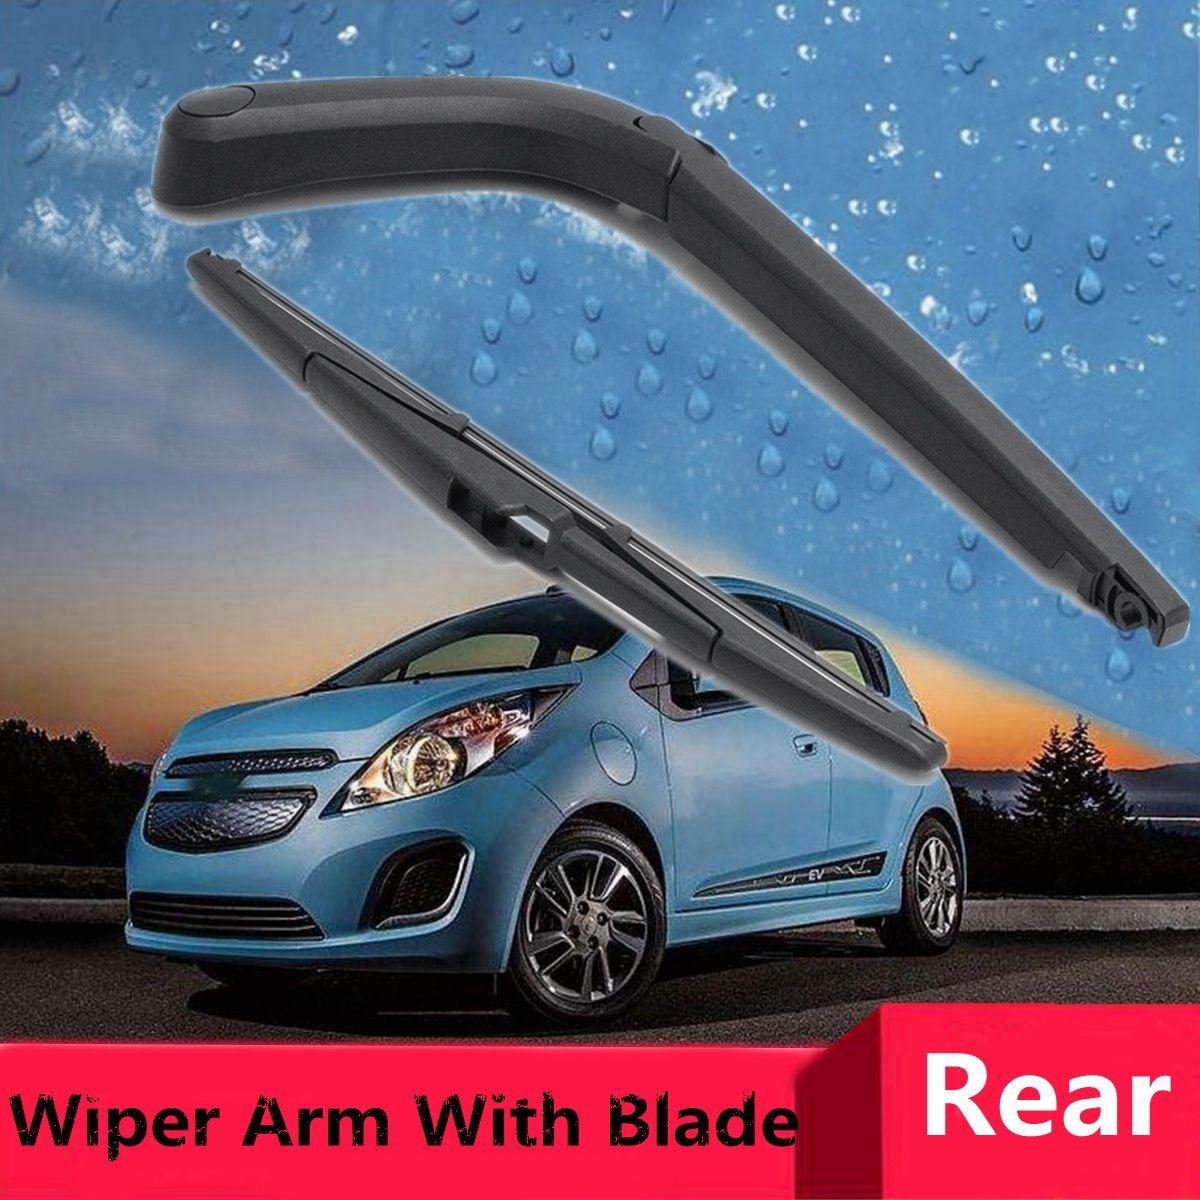 Rear Wiper Blade Arm Set Fit For Chevrolet Spark 2013-2016 Back Windshield